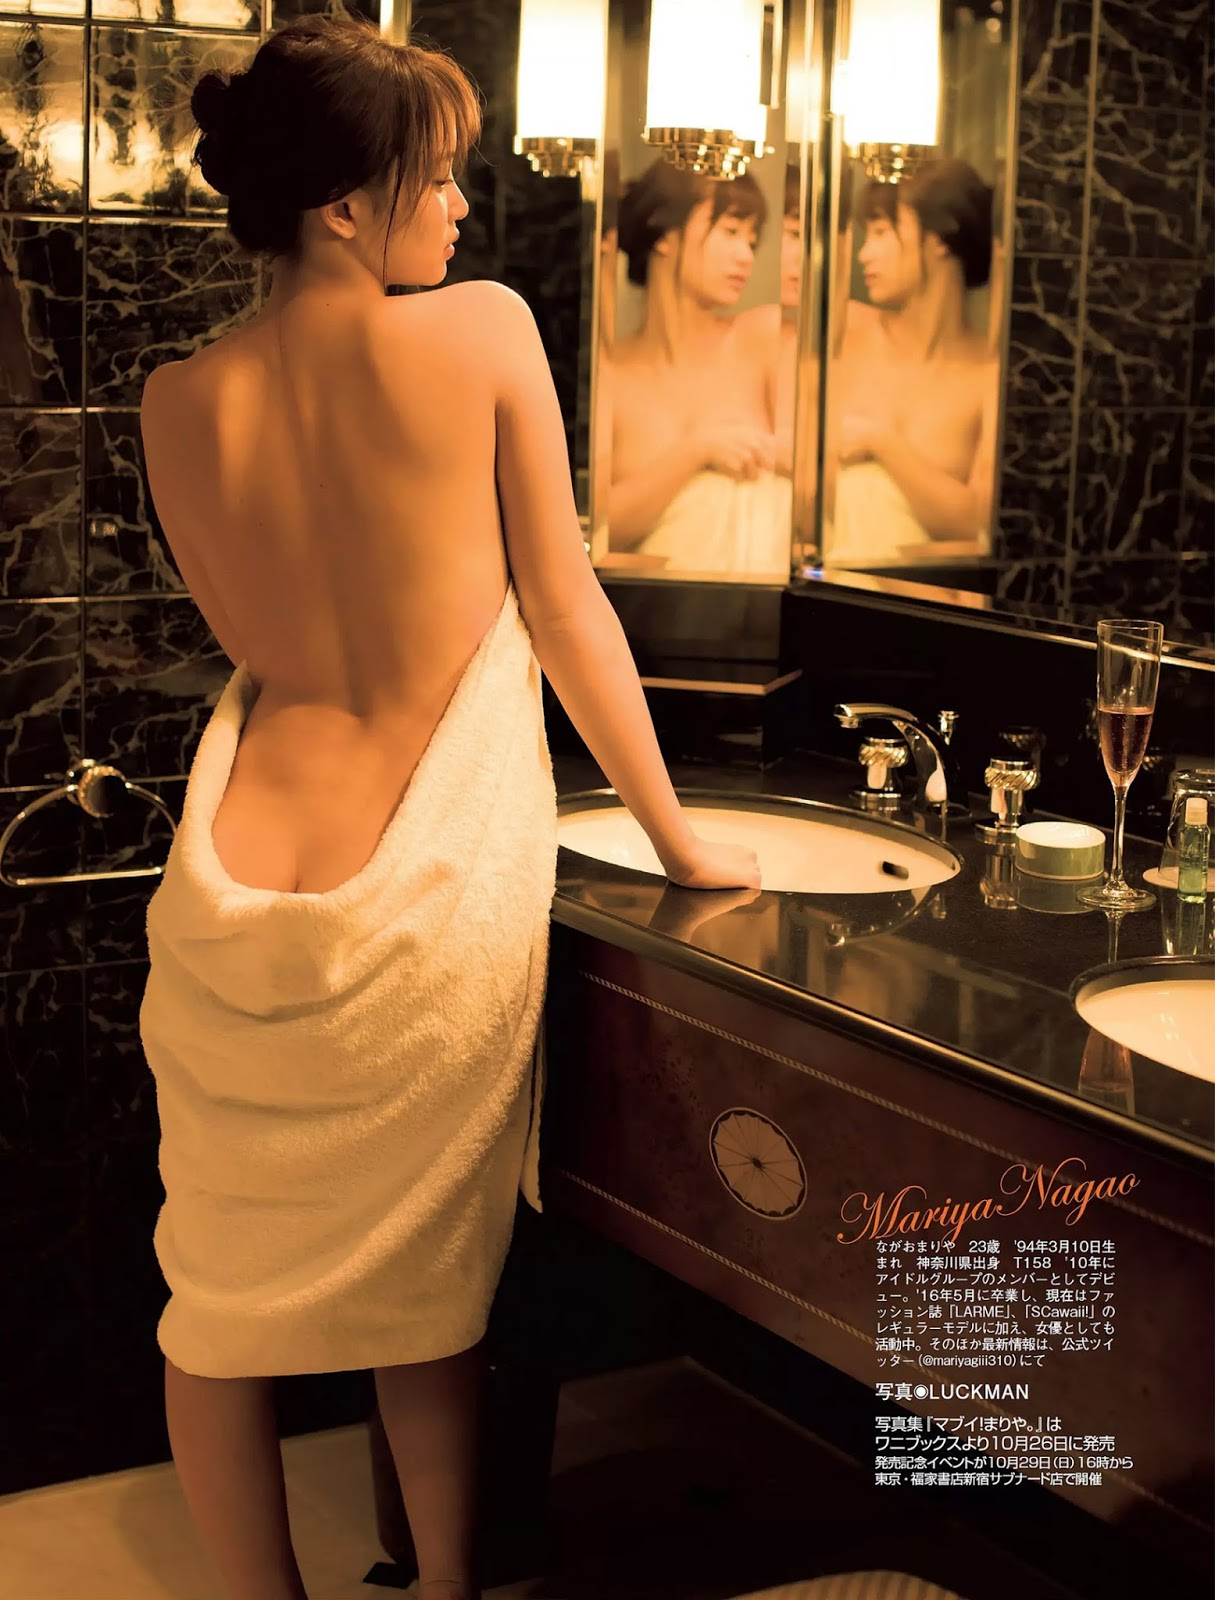 Nagao Mariya 永尾まりや, FLASH 電子版 2017.11.07 No.1444 (フラッシュ 2017年11月07日号)